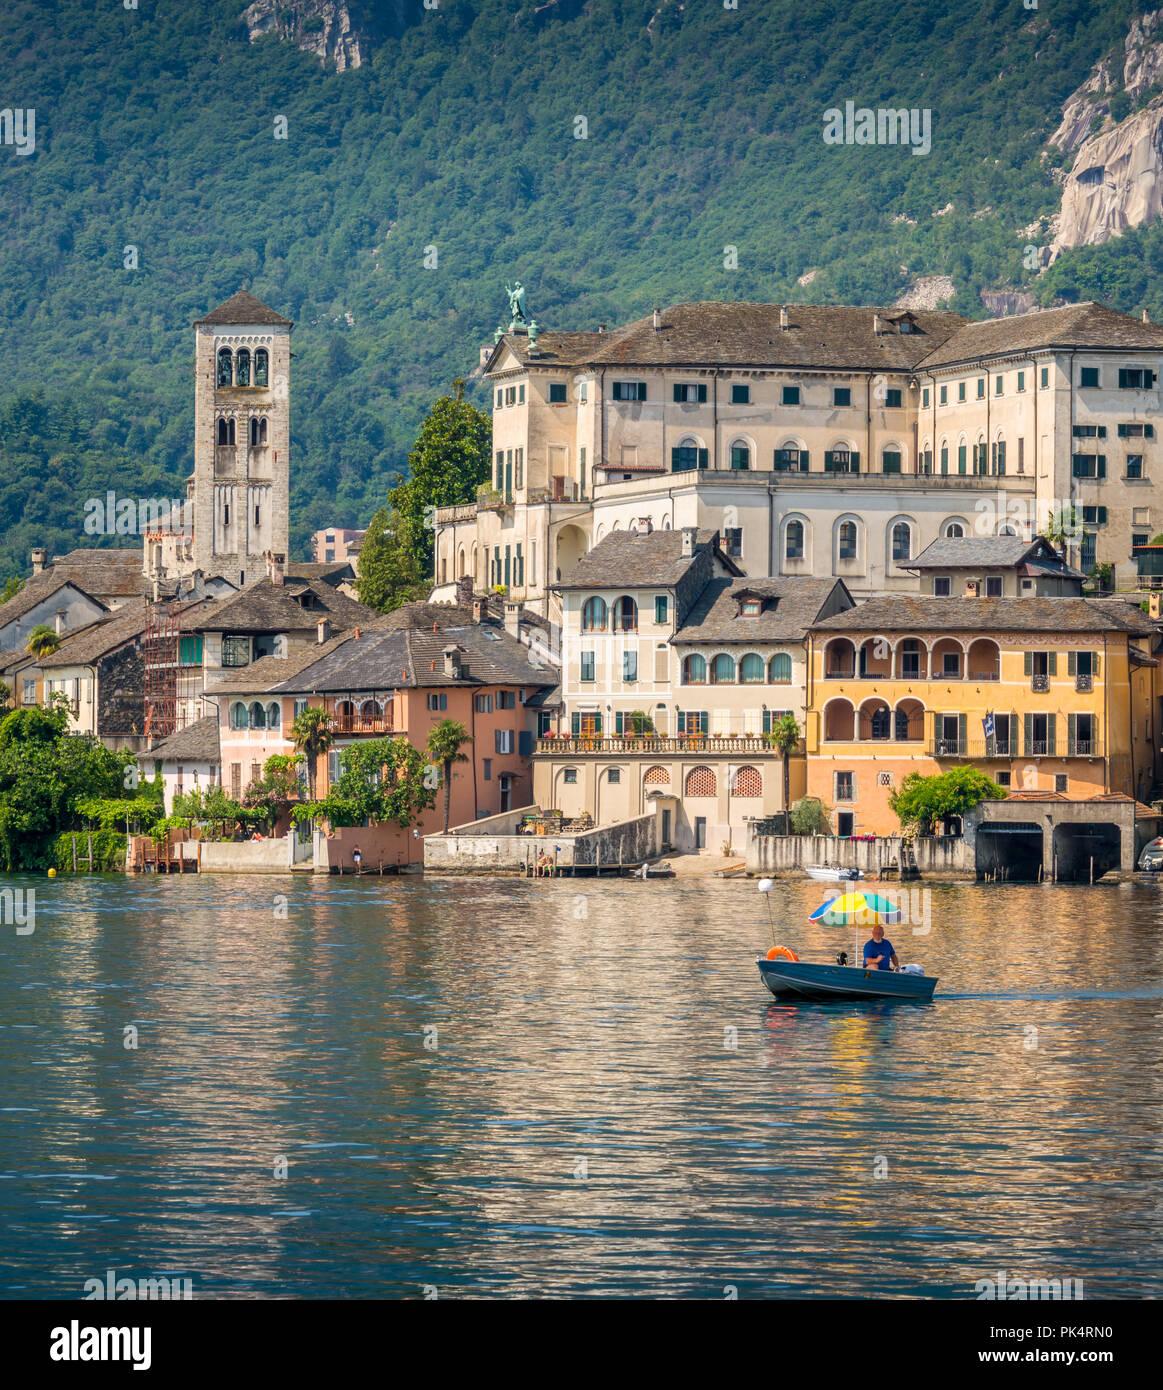 Scenic sight of San Giulio Island on Lake Orta, Piedmont, Italy. - Stock Image